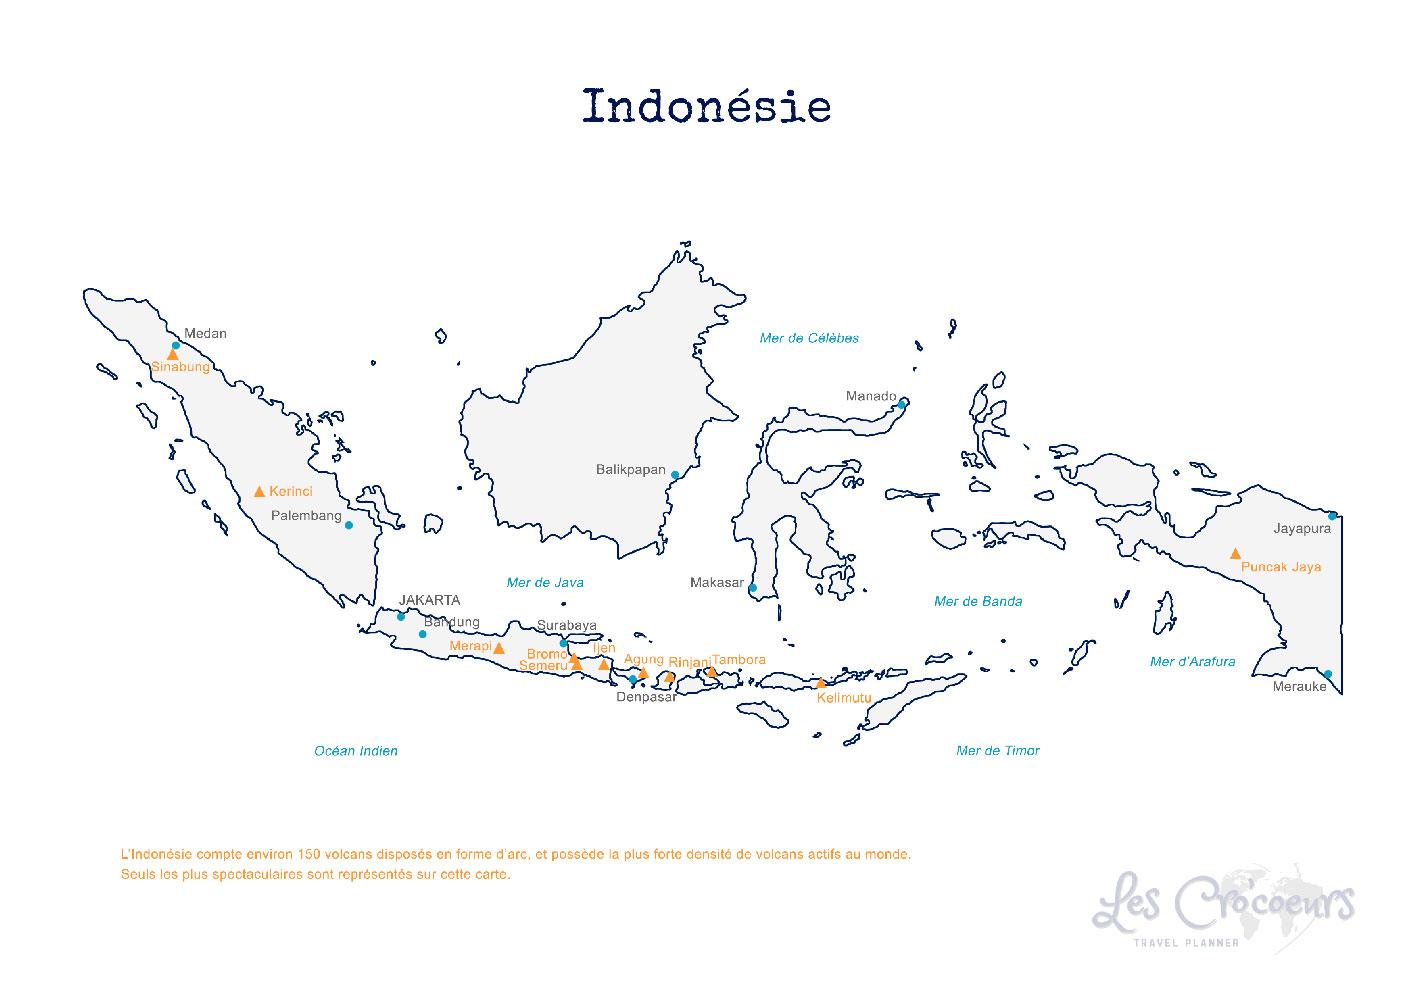 Carte Indonésie - Les Cro'coeurs Travel Planner & Blog Voyage